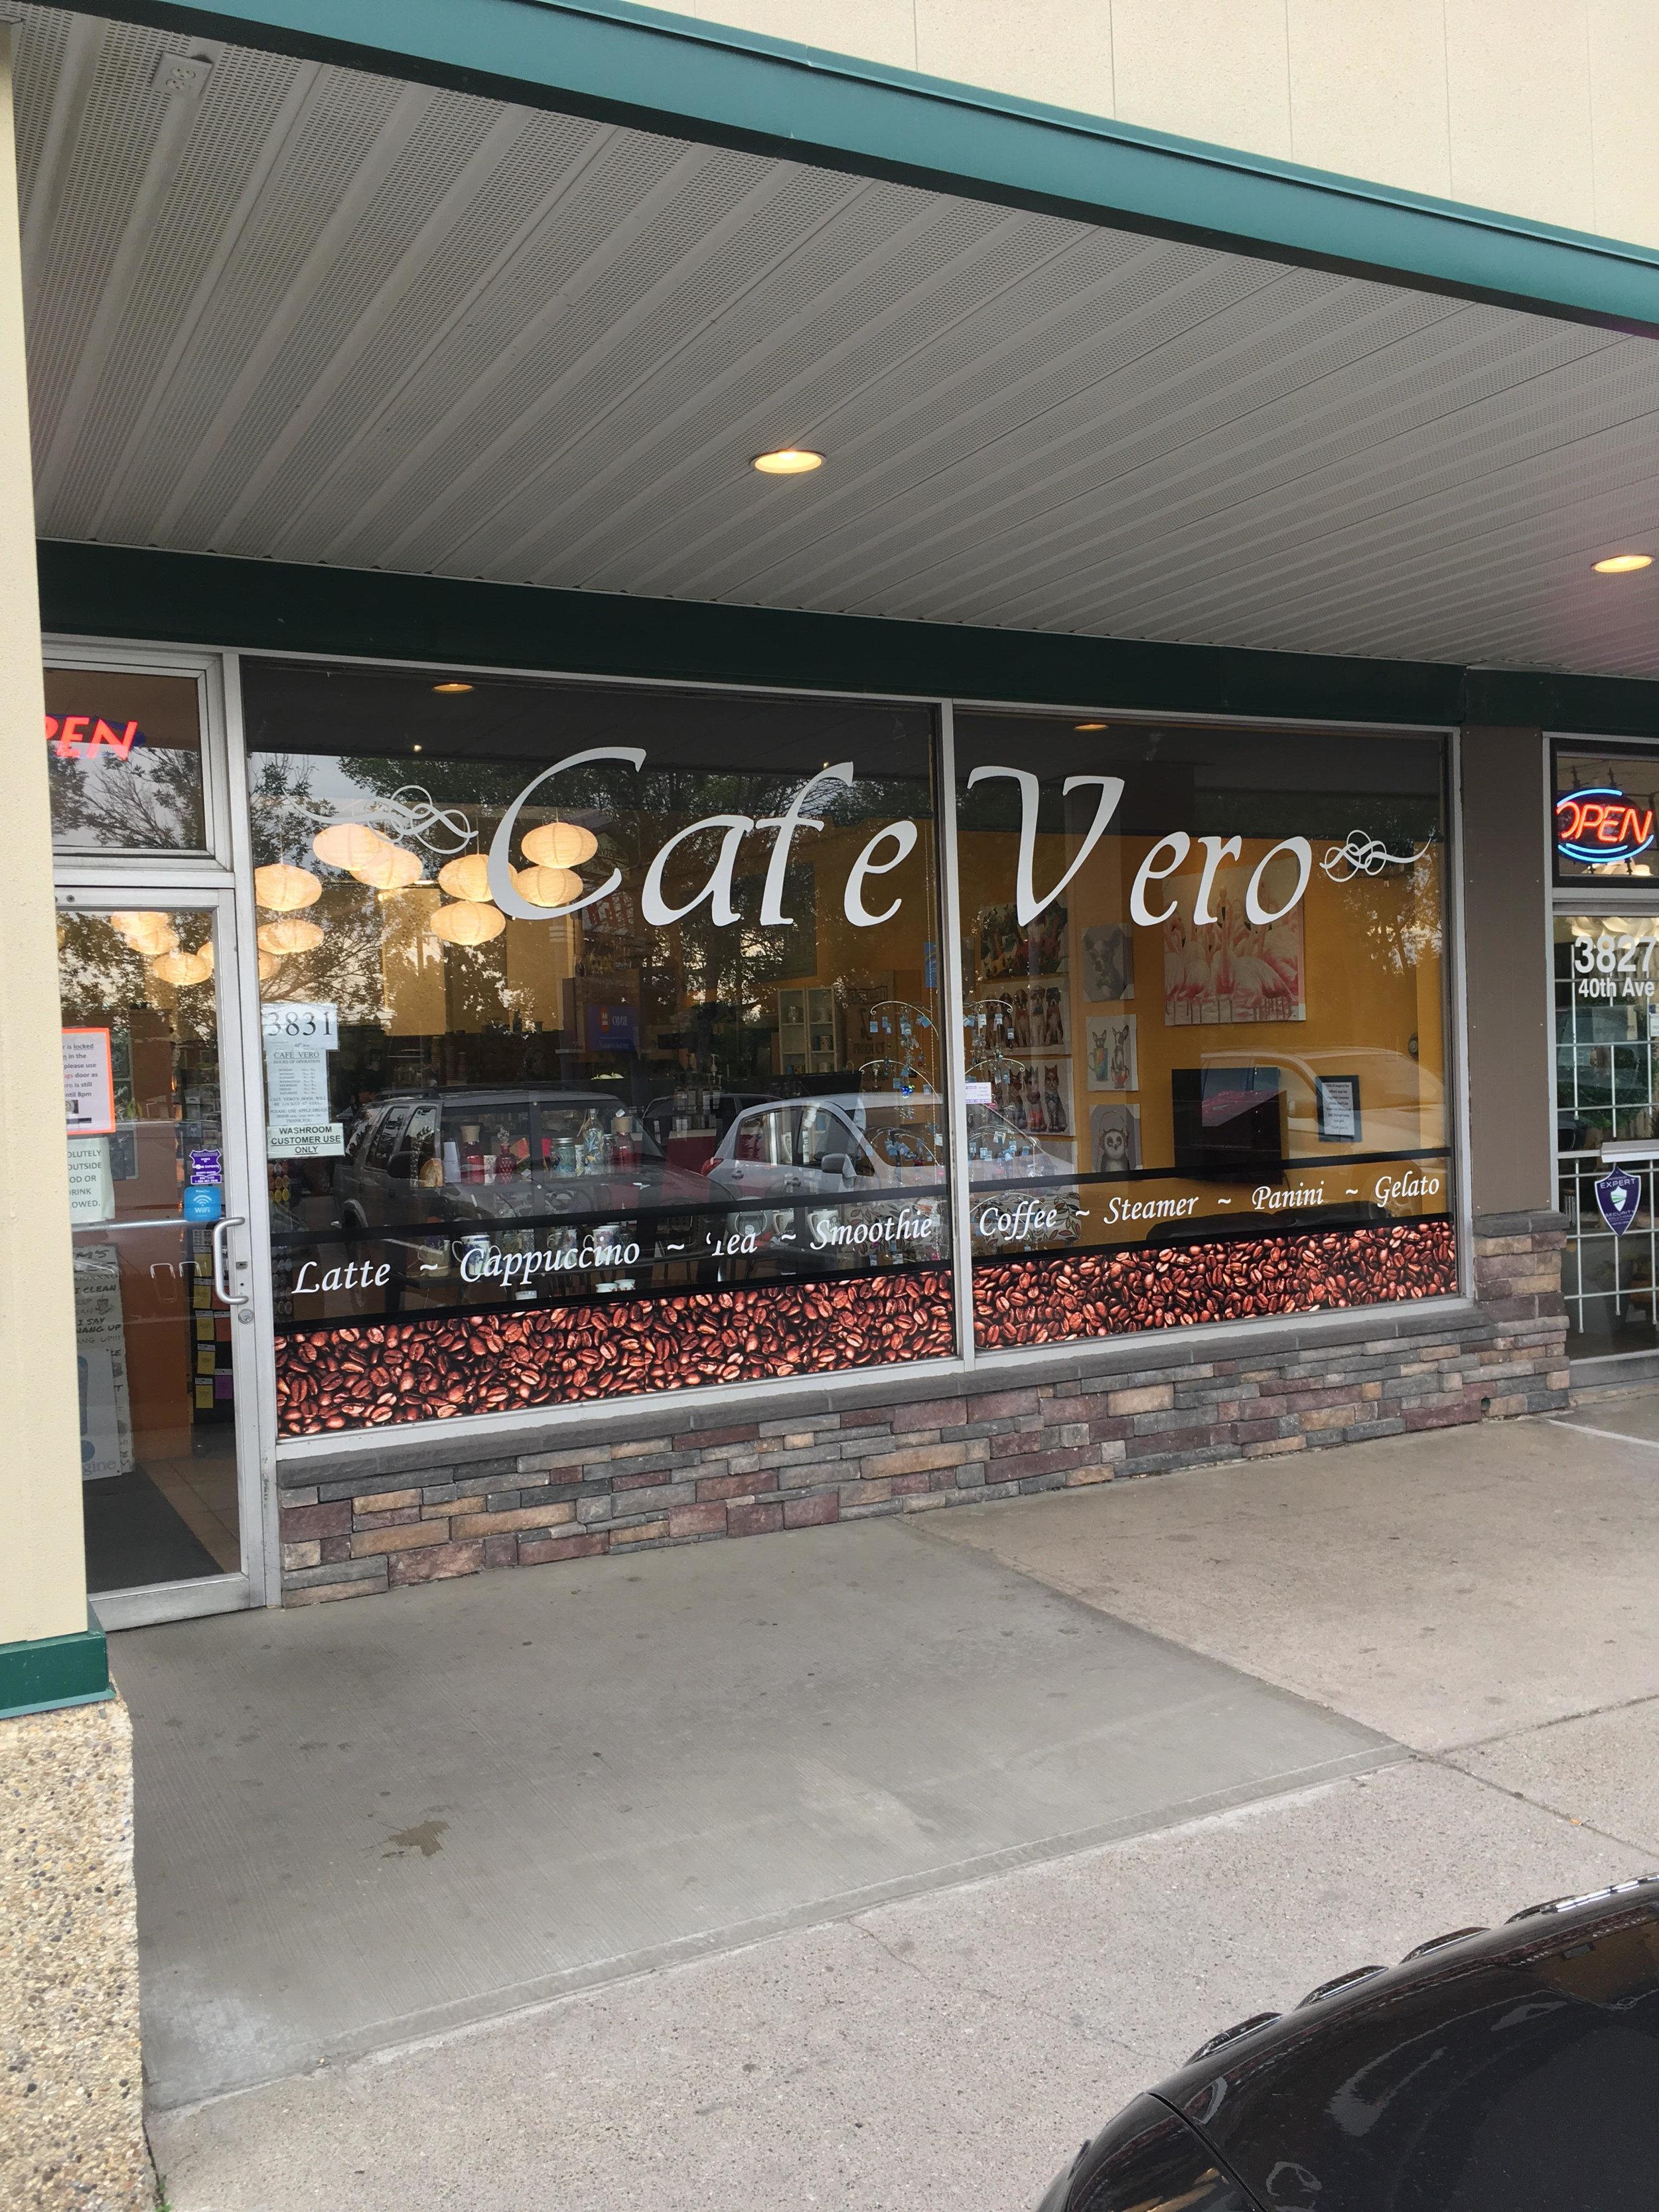 Café Vero - 3831 40 Ave, Red Deer, Alberta